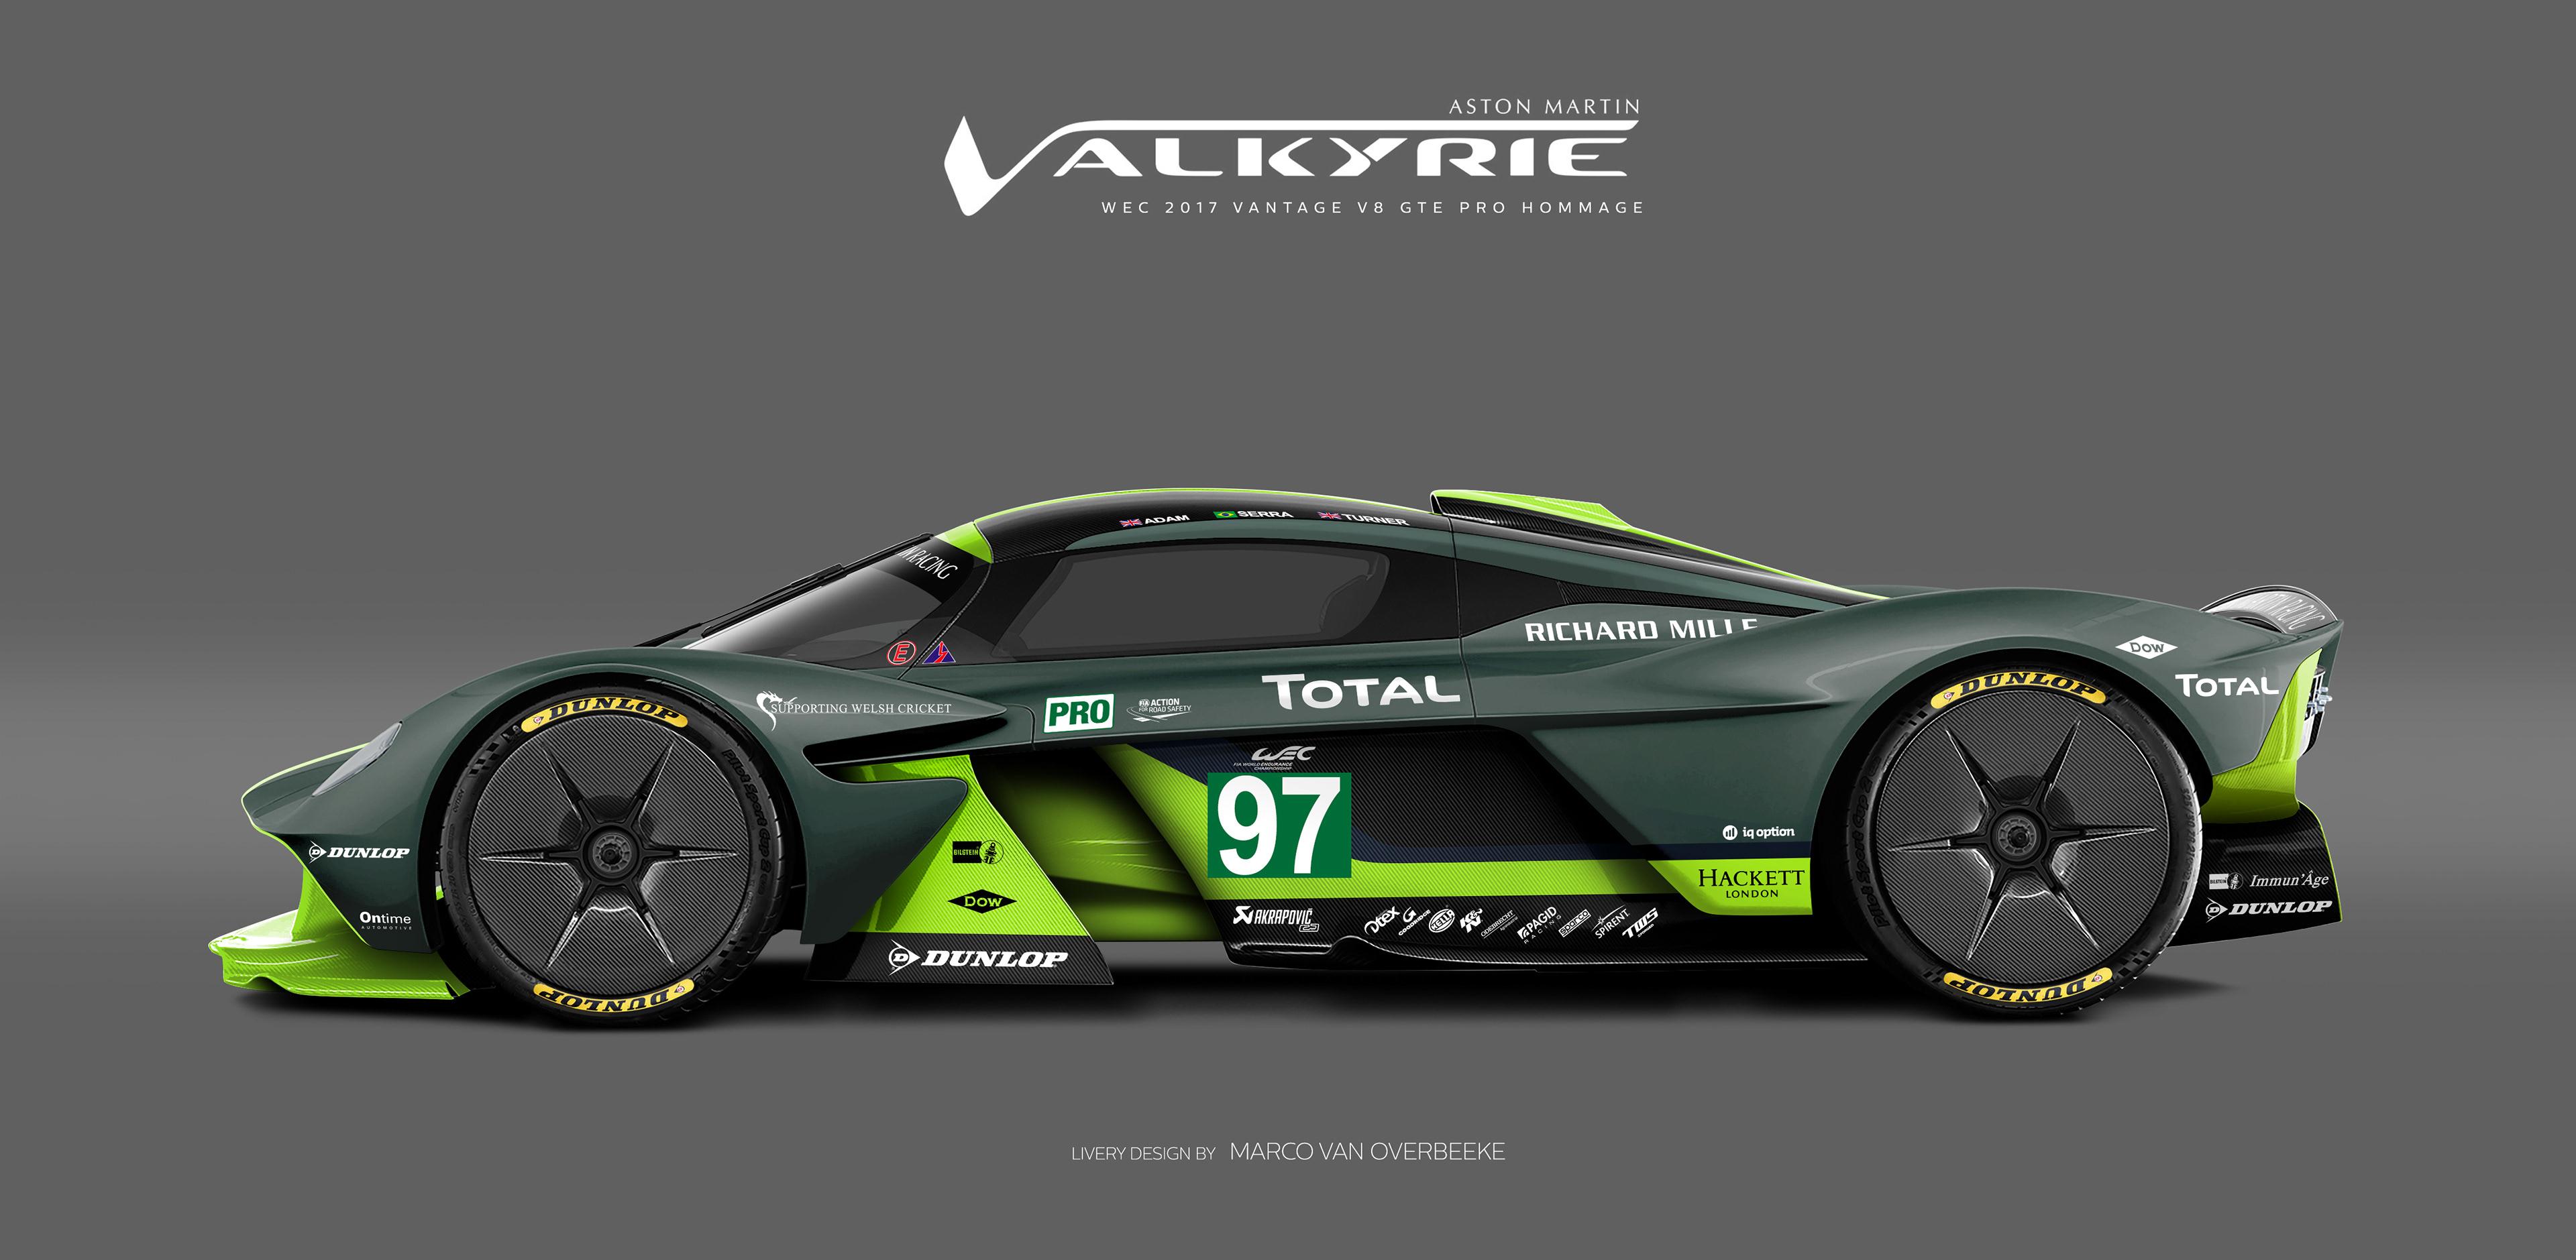 Aston Martin Used Car Ad >> Marco van Overbeeke | freelance automotive designer - Aston Martin Valkyrie Heritage & AMR Pro ...